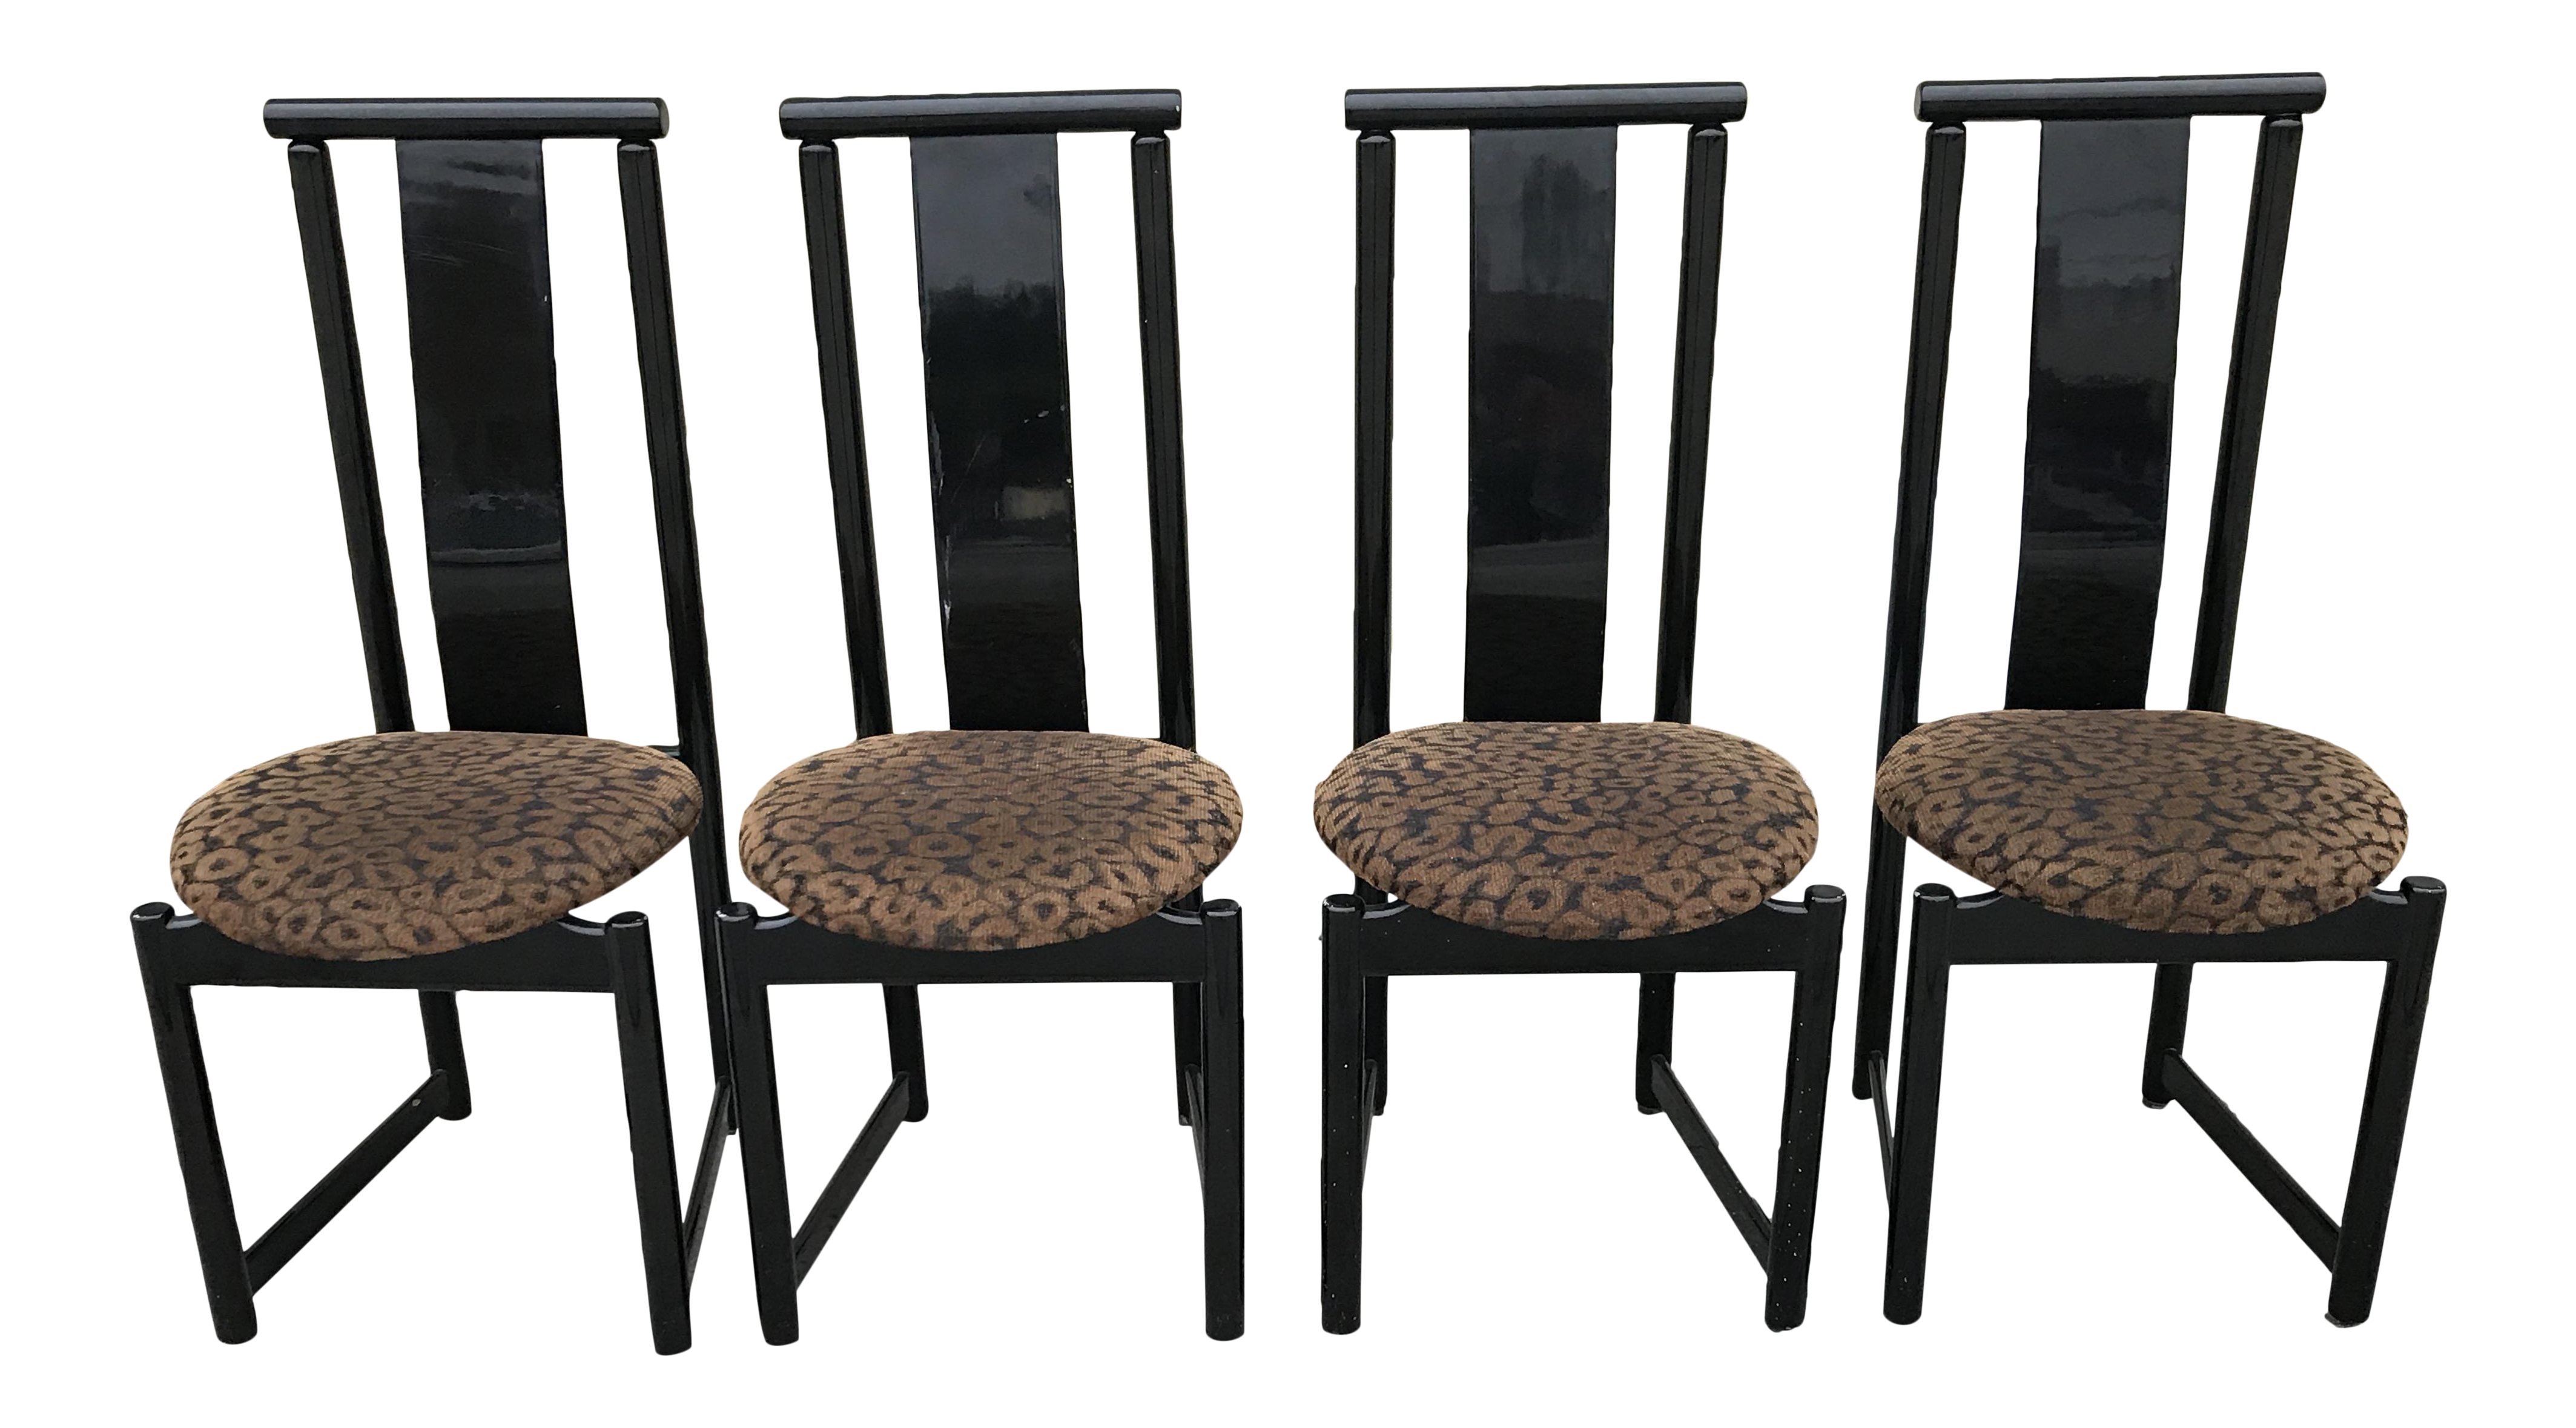 Cheetah Print Dining Chairs Best Cheetah Image And Photo  : 1980s black cheetah print dining chairs set of 4 0126 from cheetah.tigonps.us size 4254 x 2358 png 7758kB